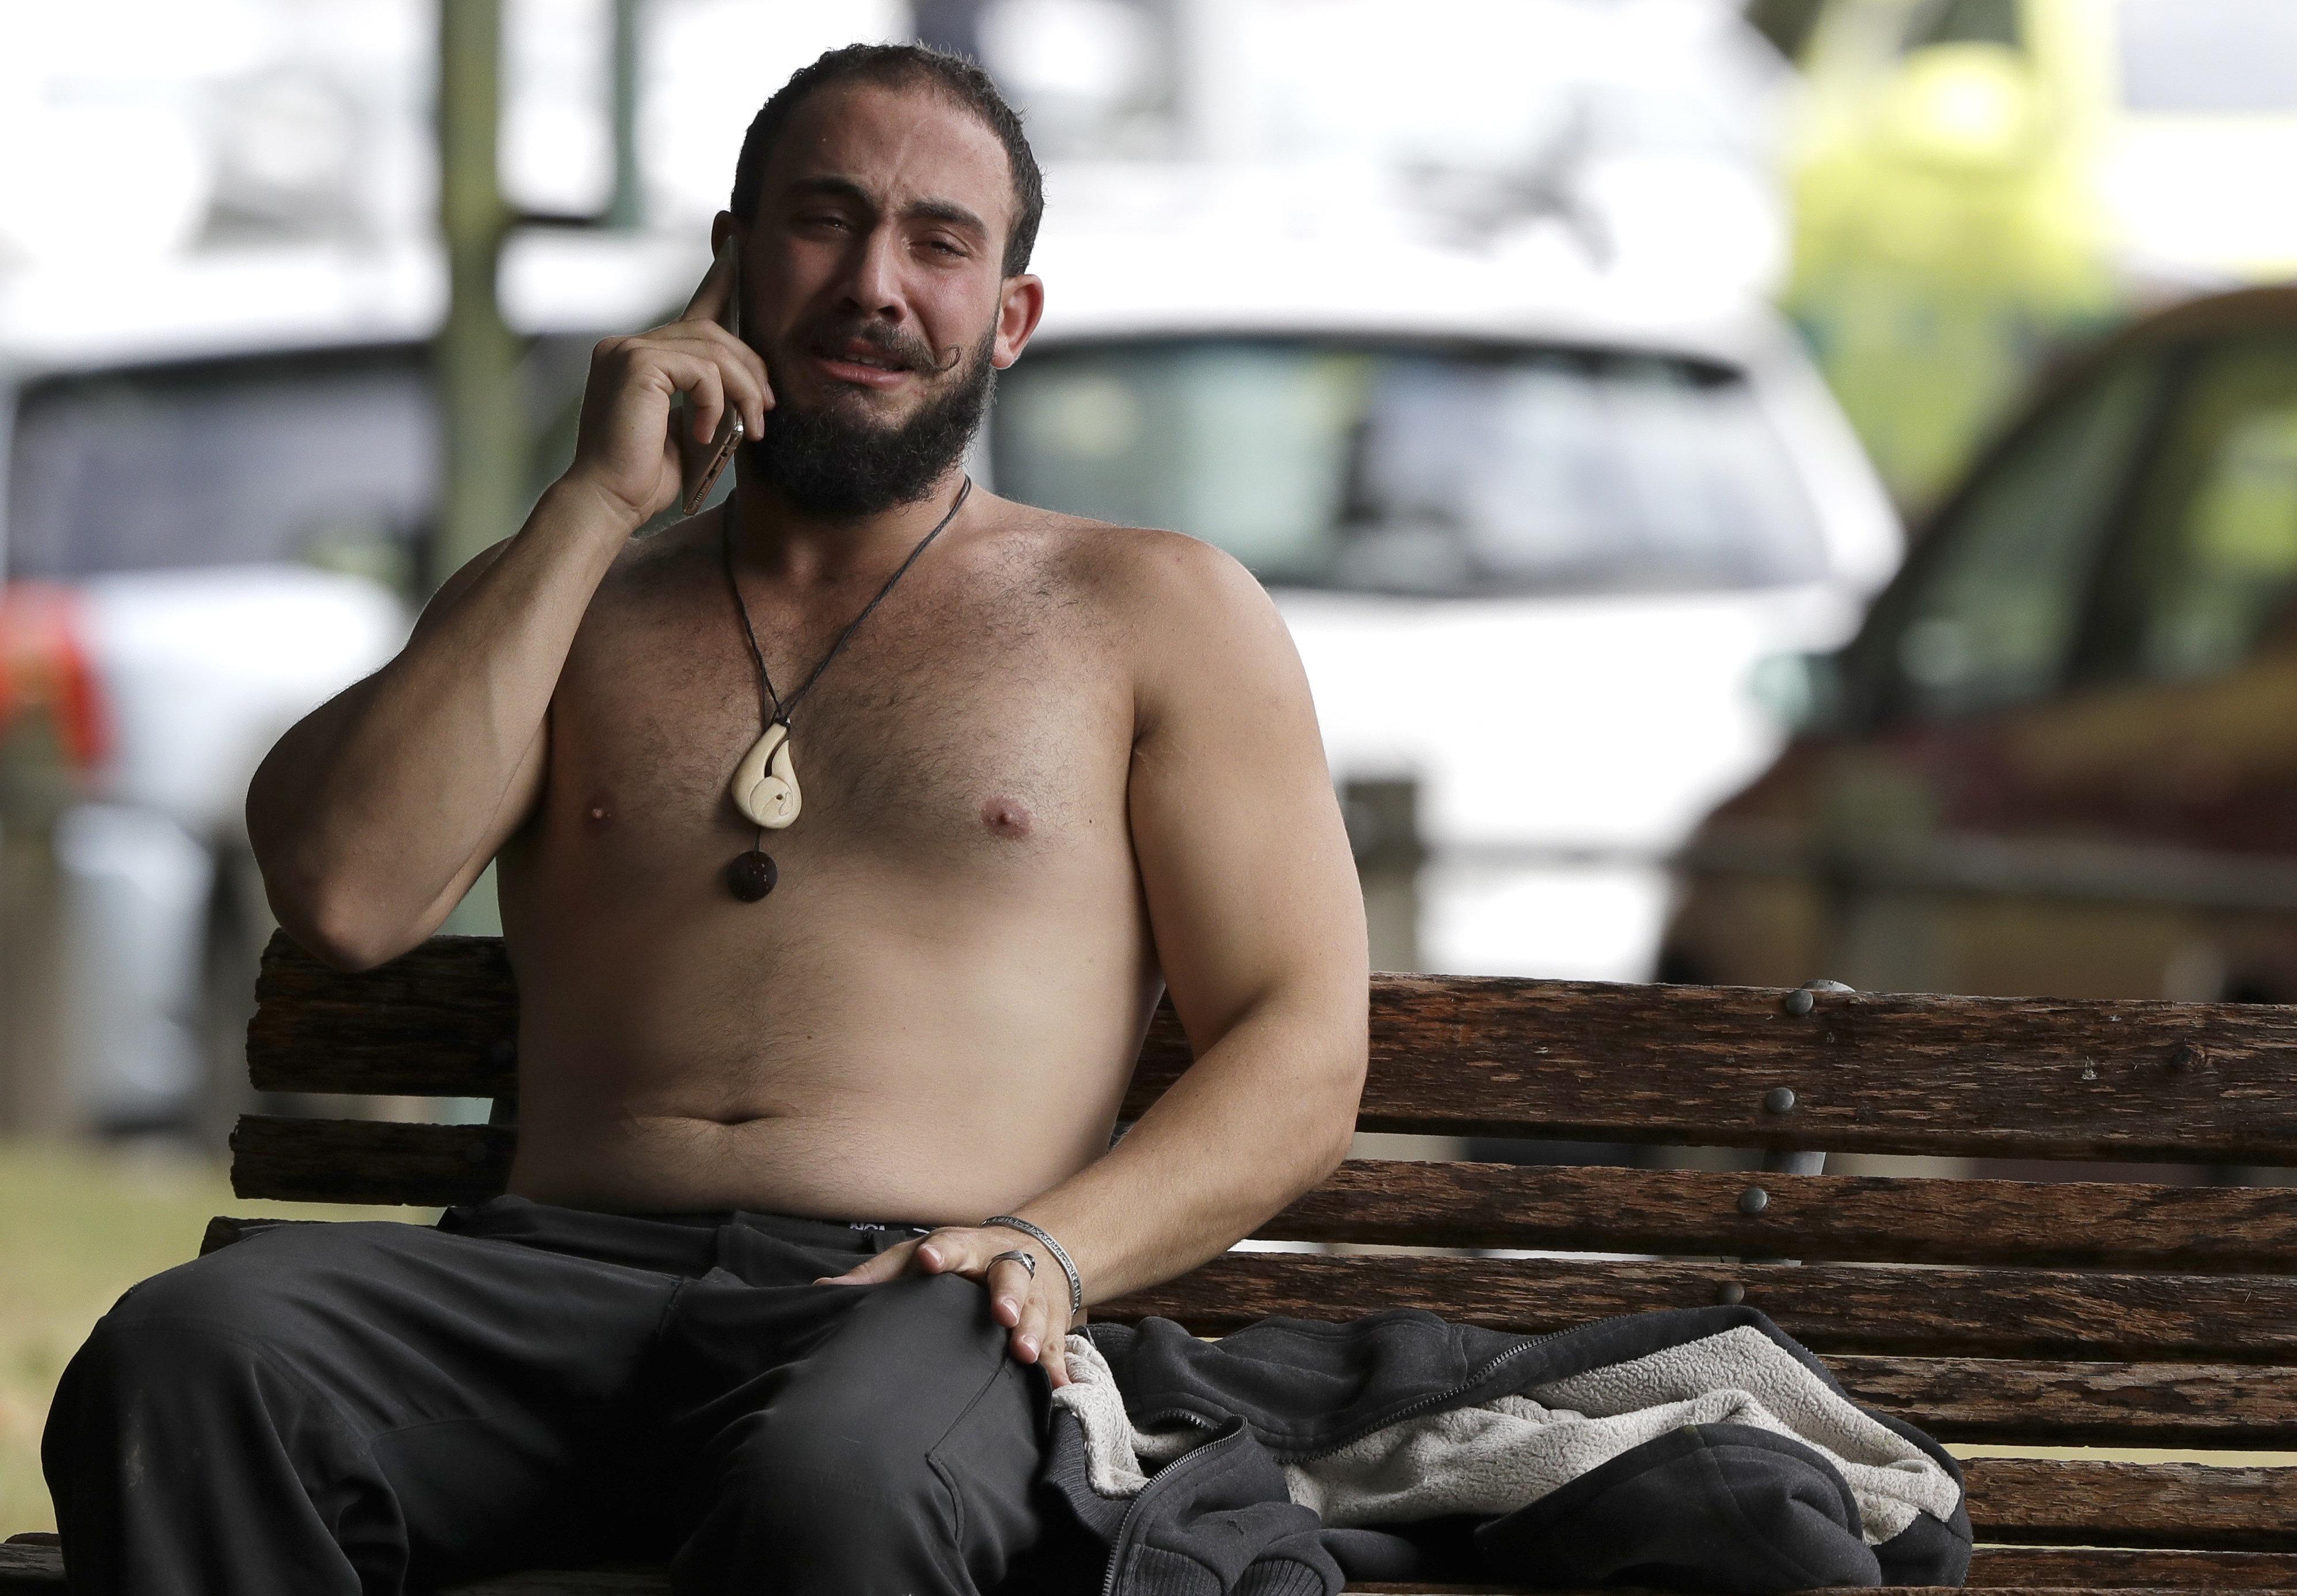 'New Zealand's Darkest Day': Celebs, Politicians, Others Share Heartbreak On